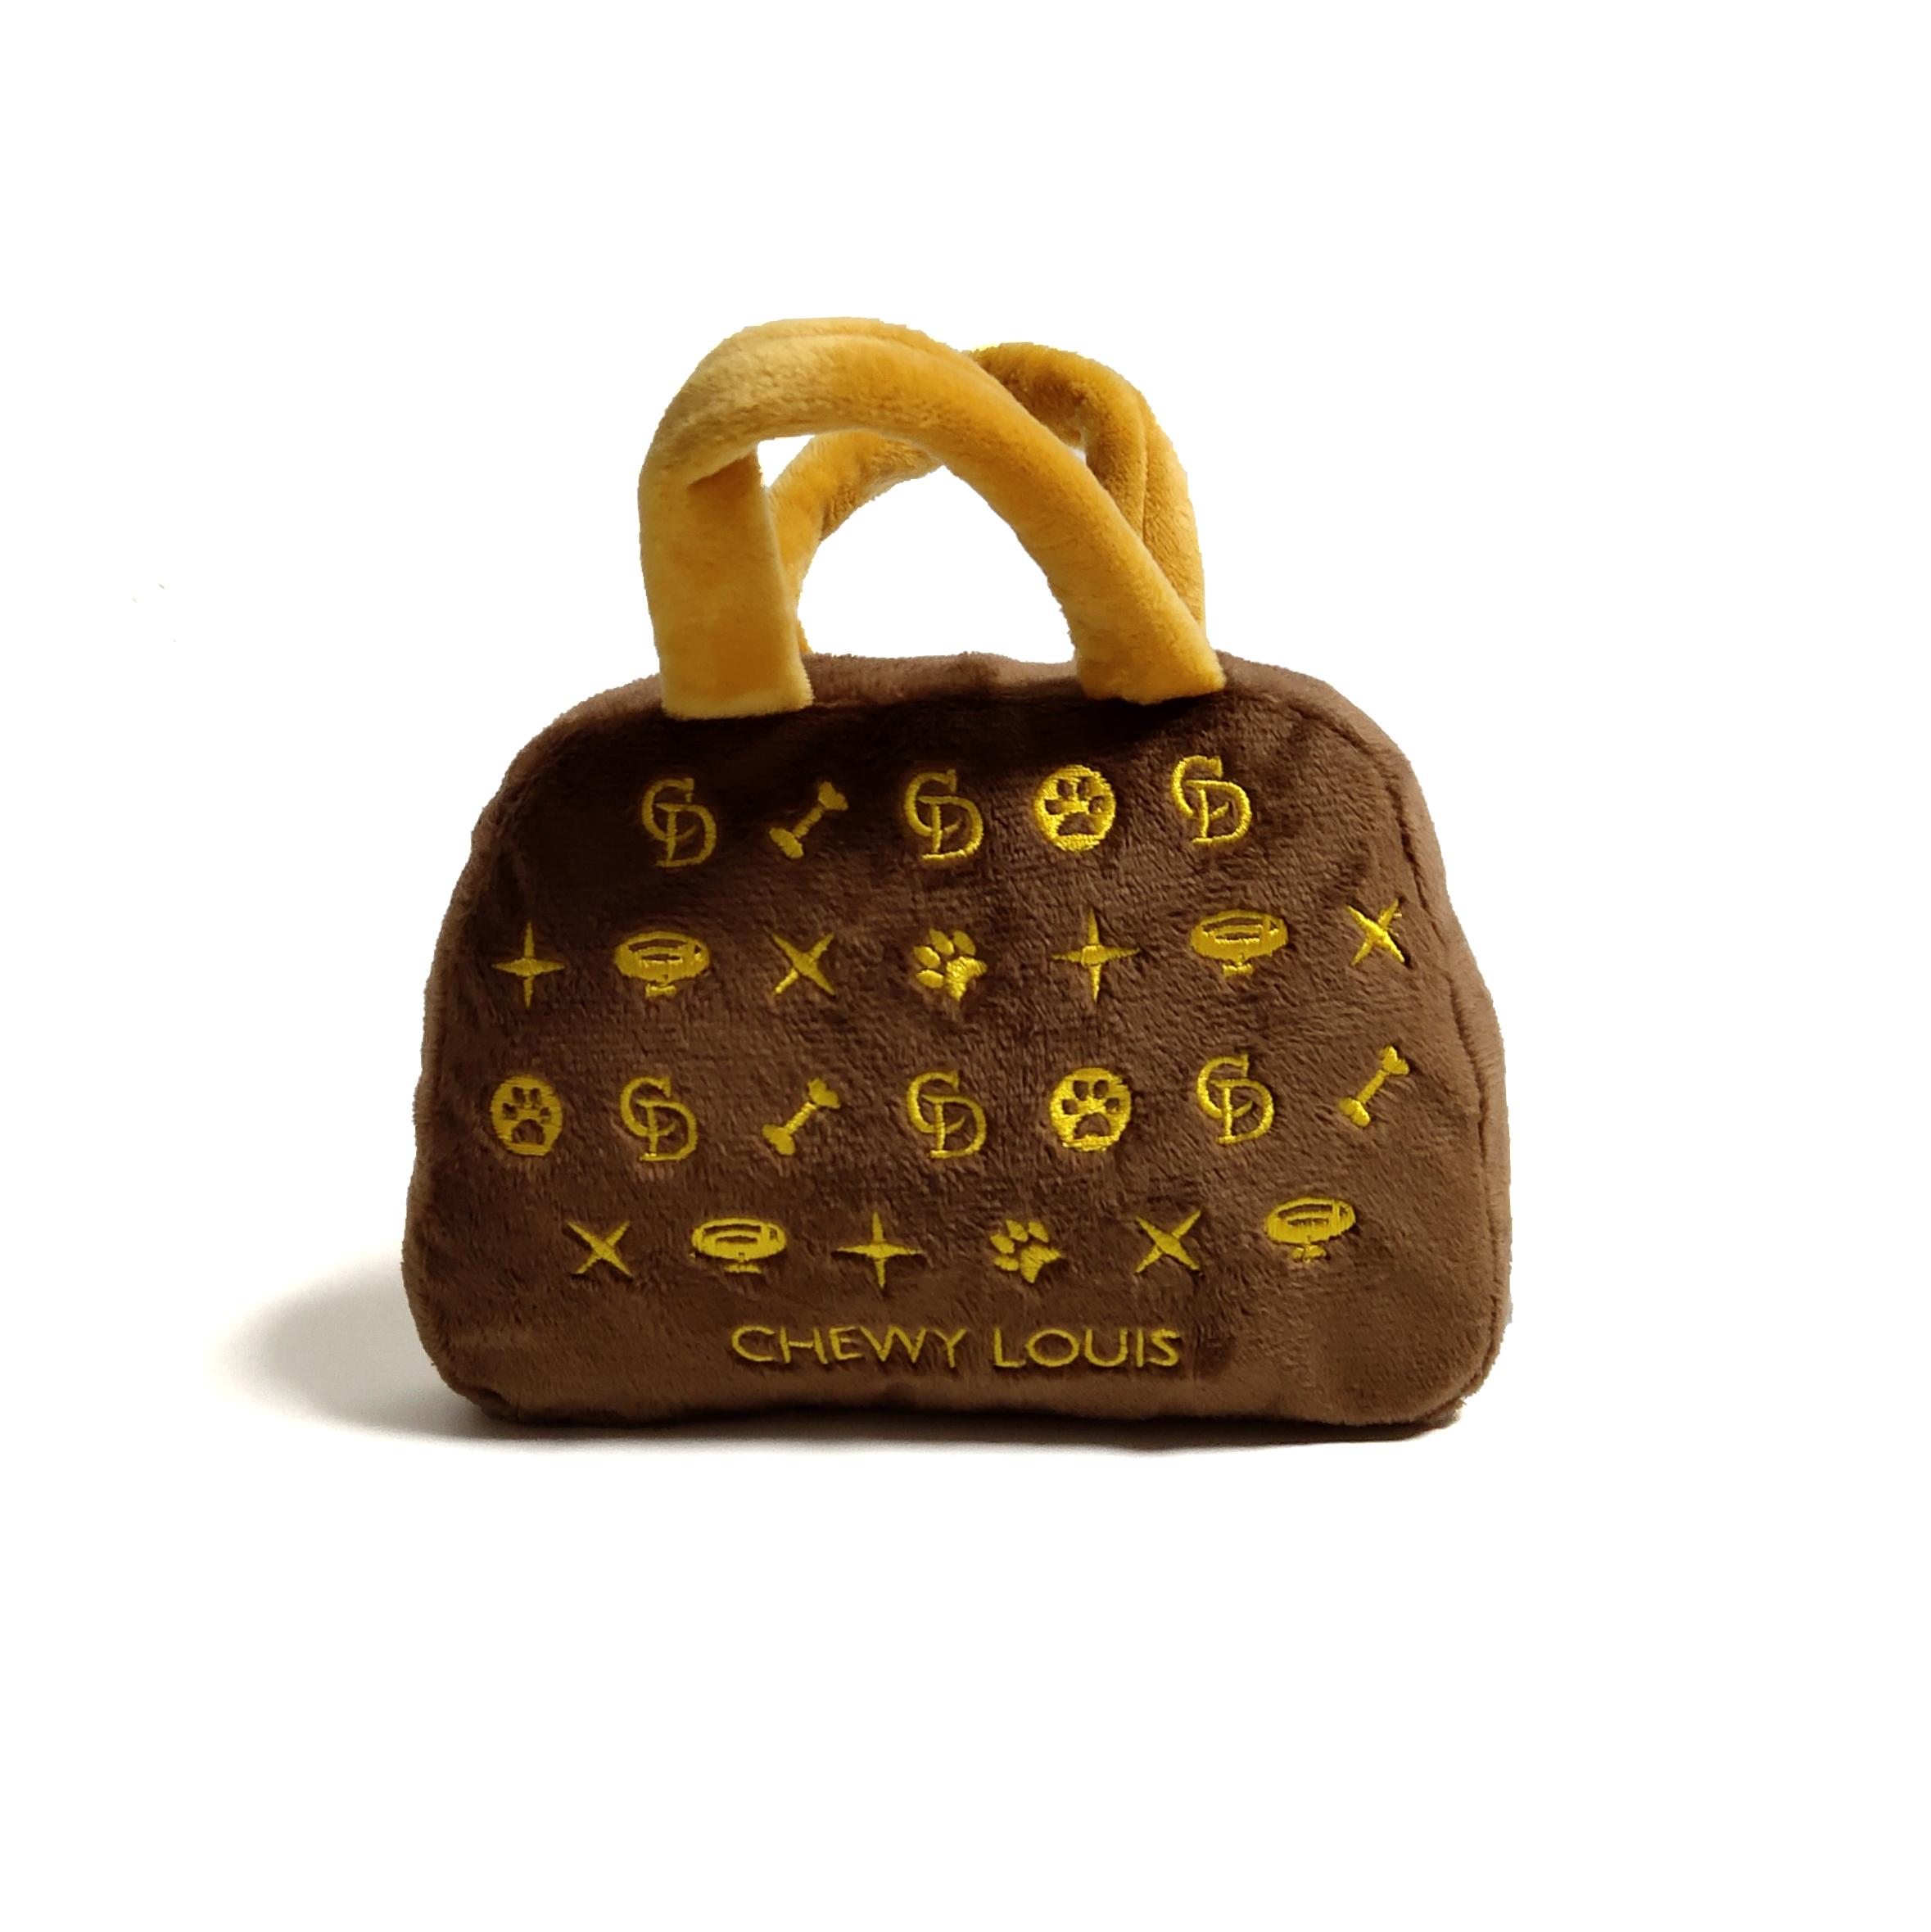 CatwalkDog Chewy Louis Handbag Parody Plush Dog Toy